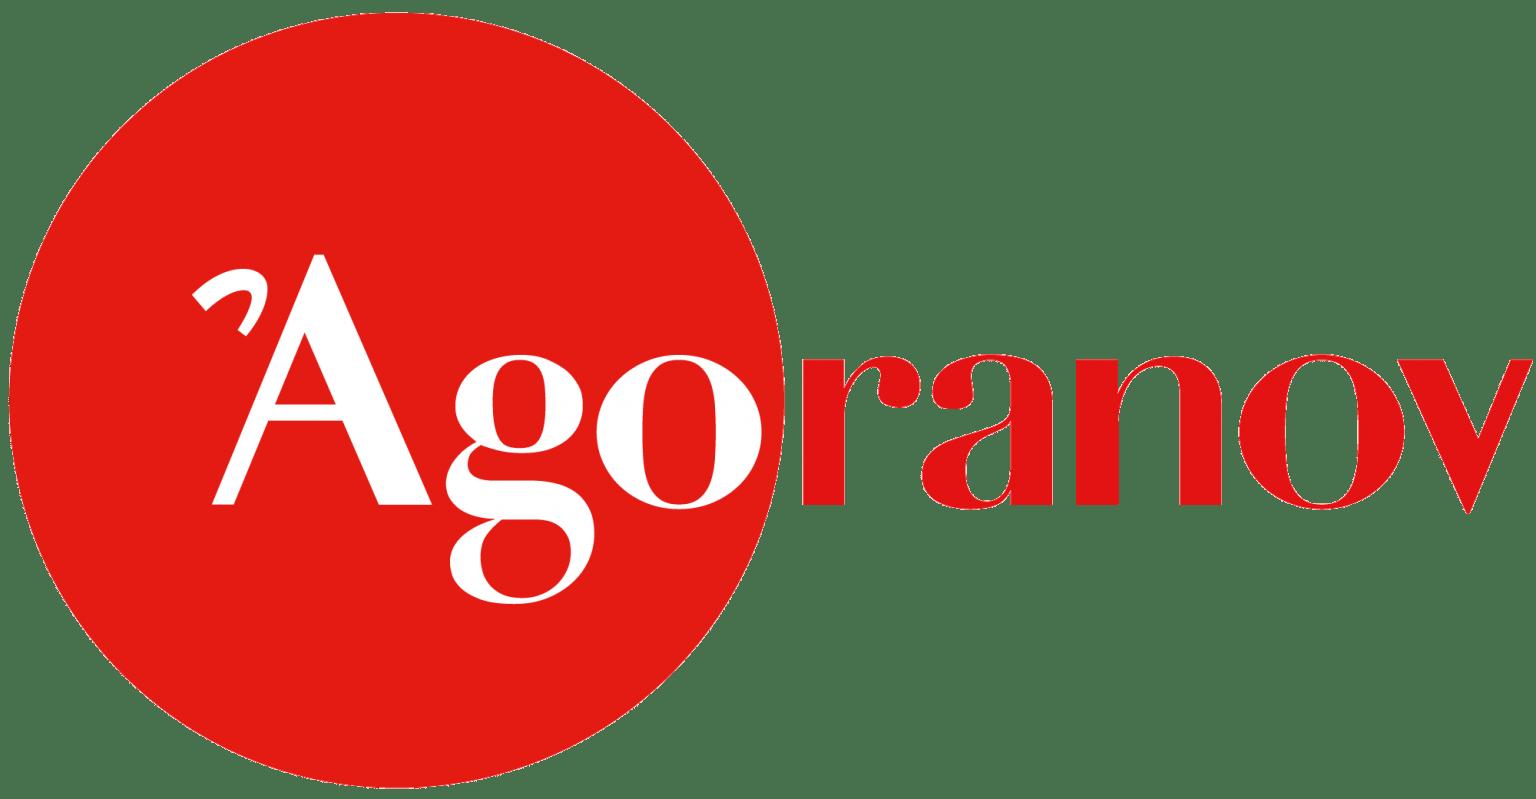 Agoranov-1536x799-2-min